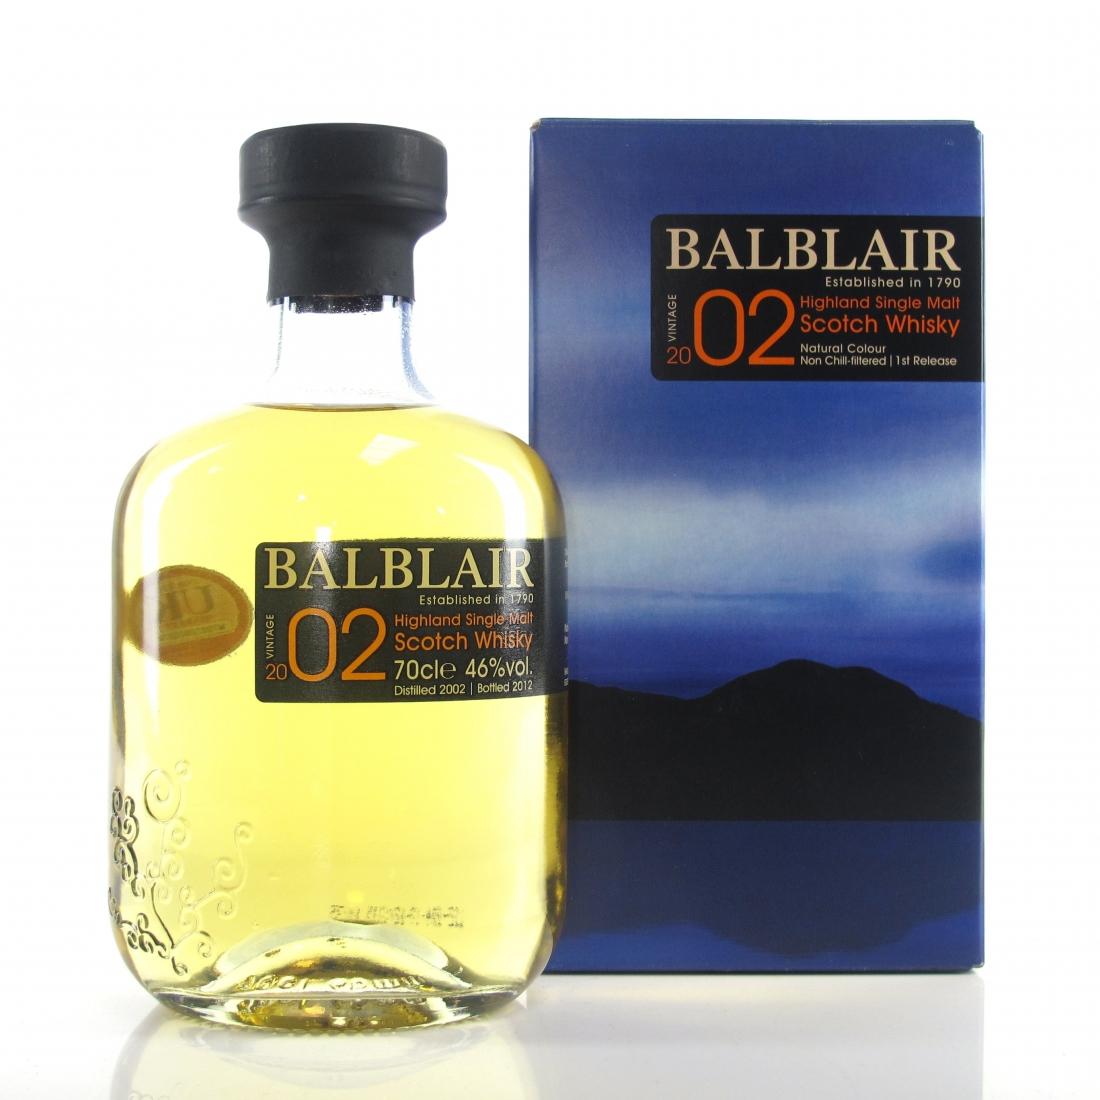 Balblair 2002 1st Release 2012